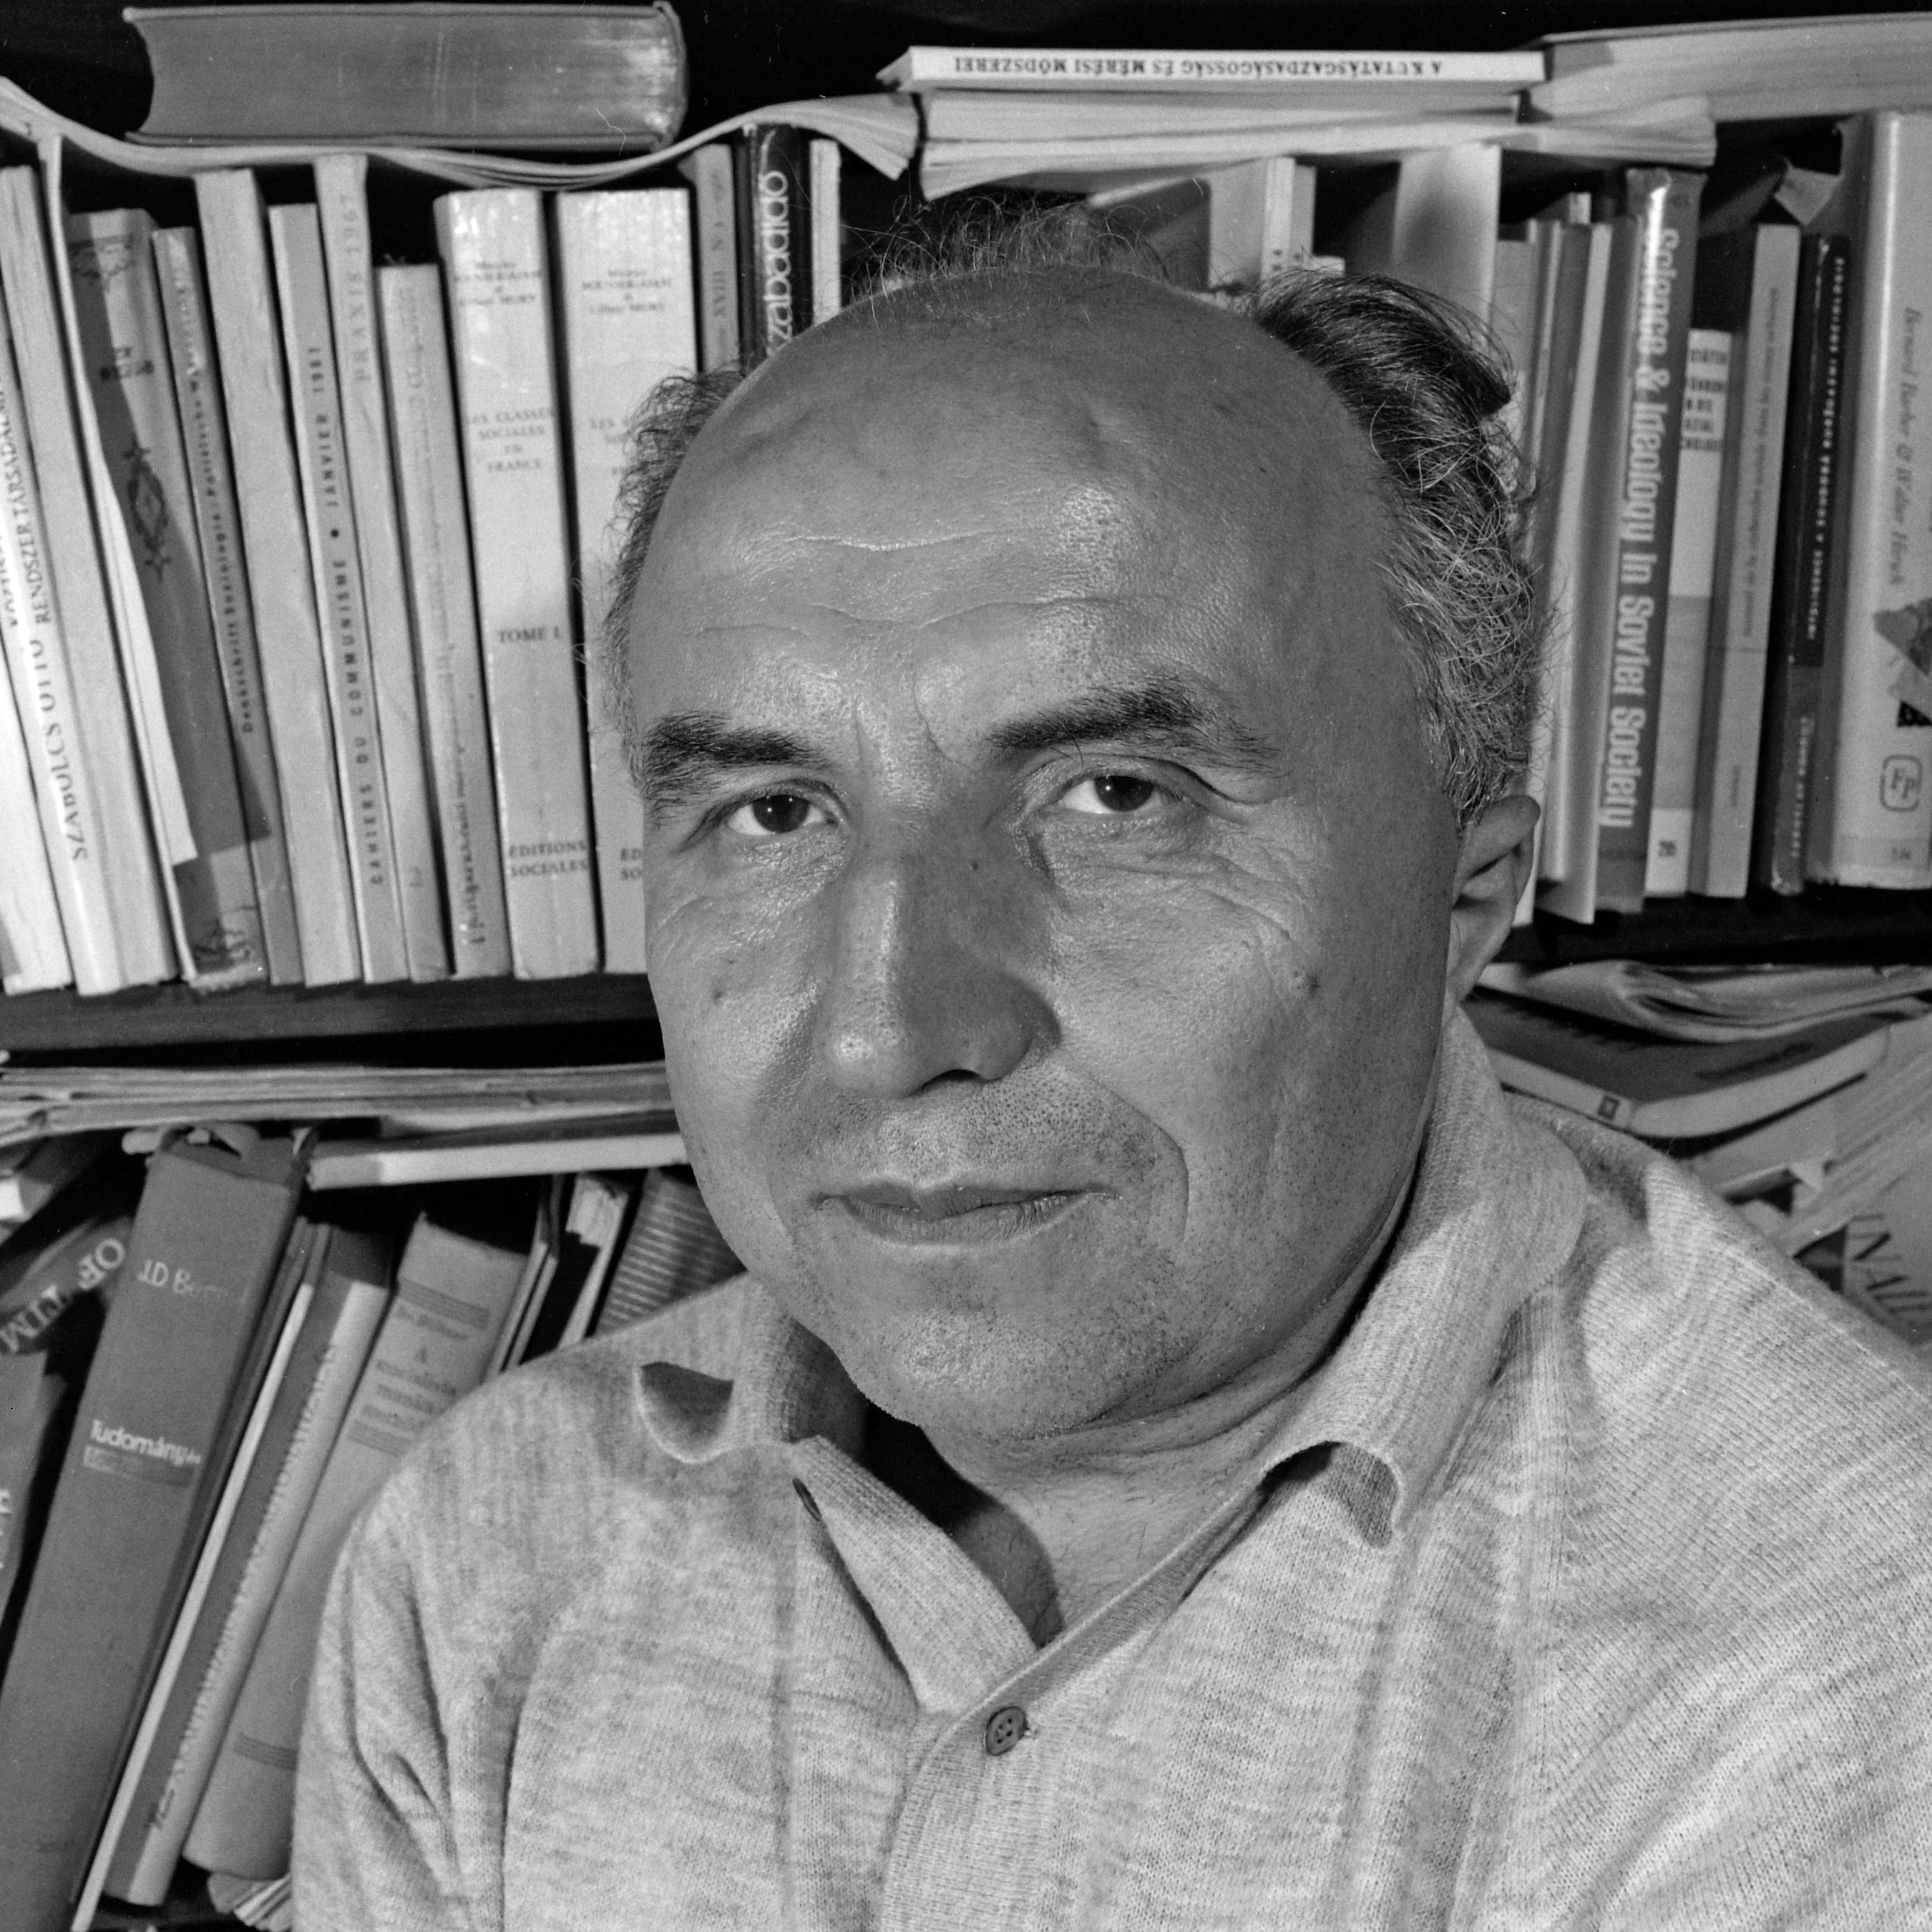 András Hegedűs sociologist, 1969.